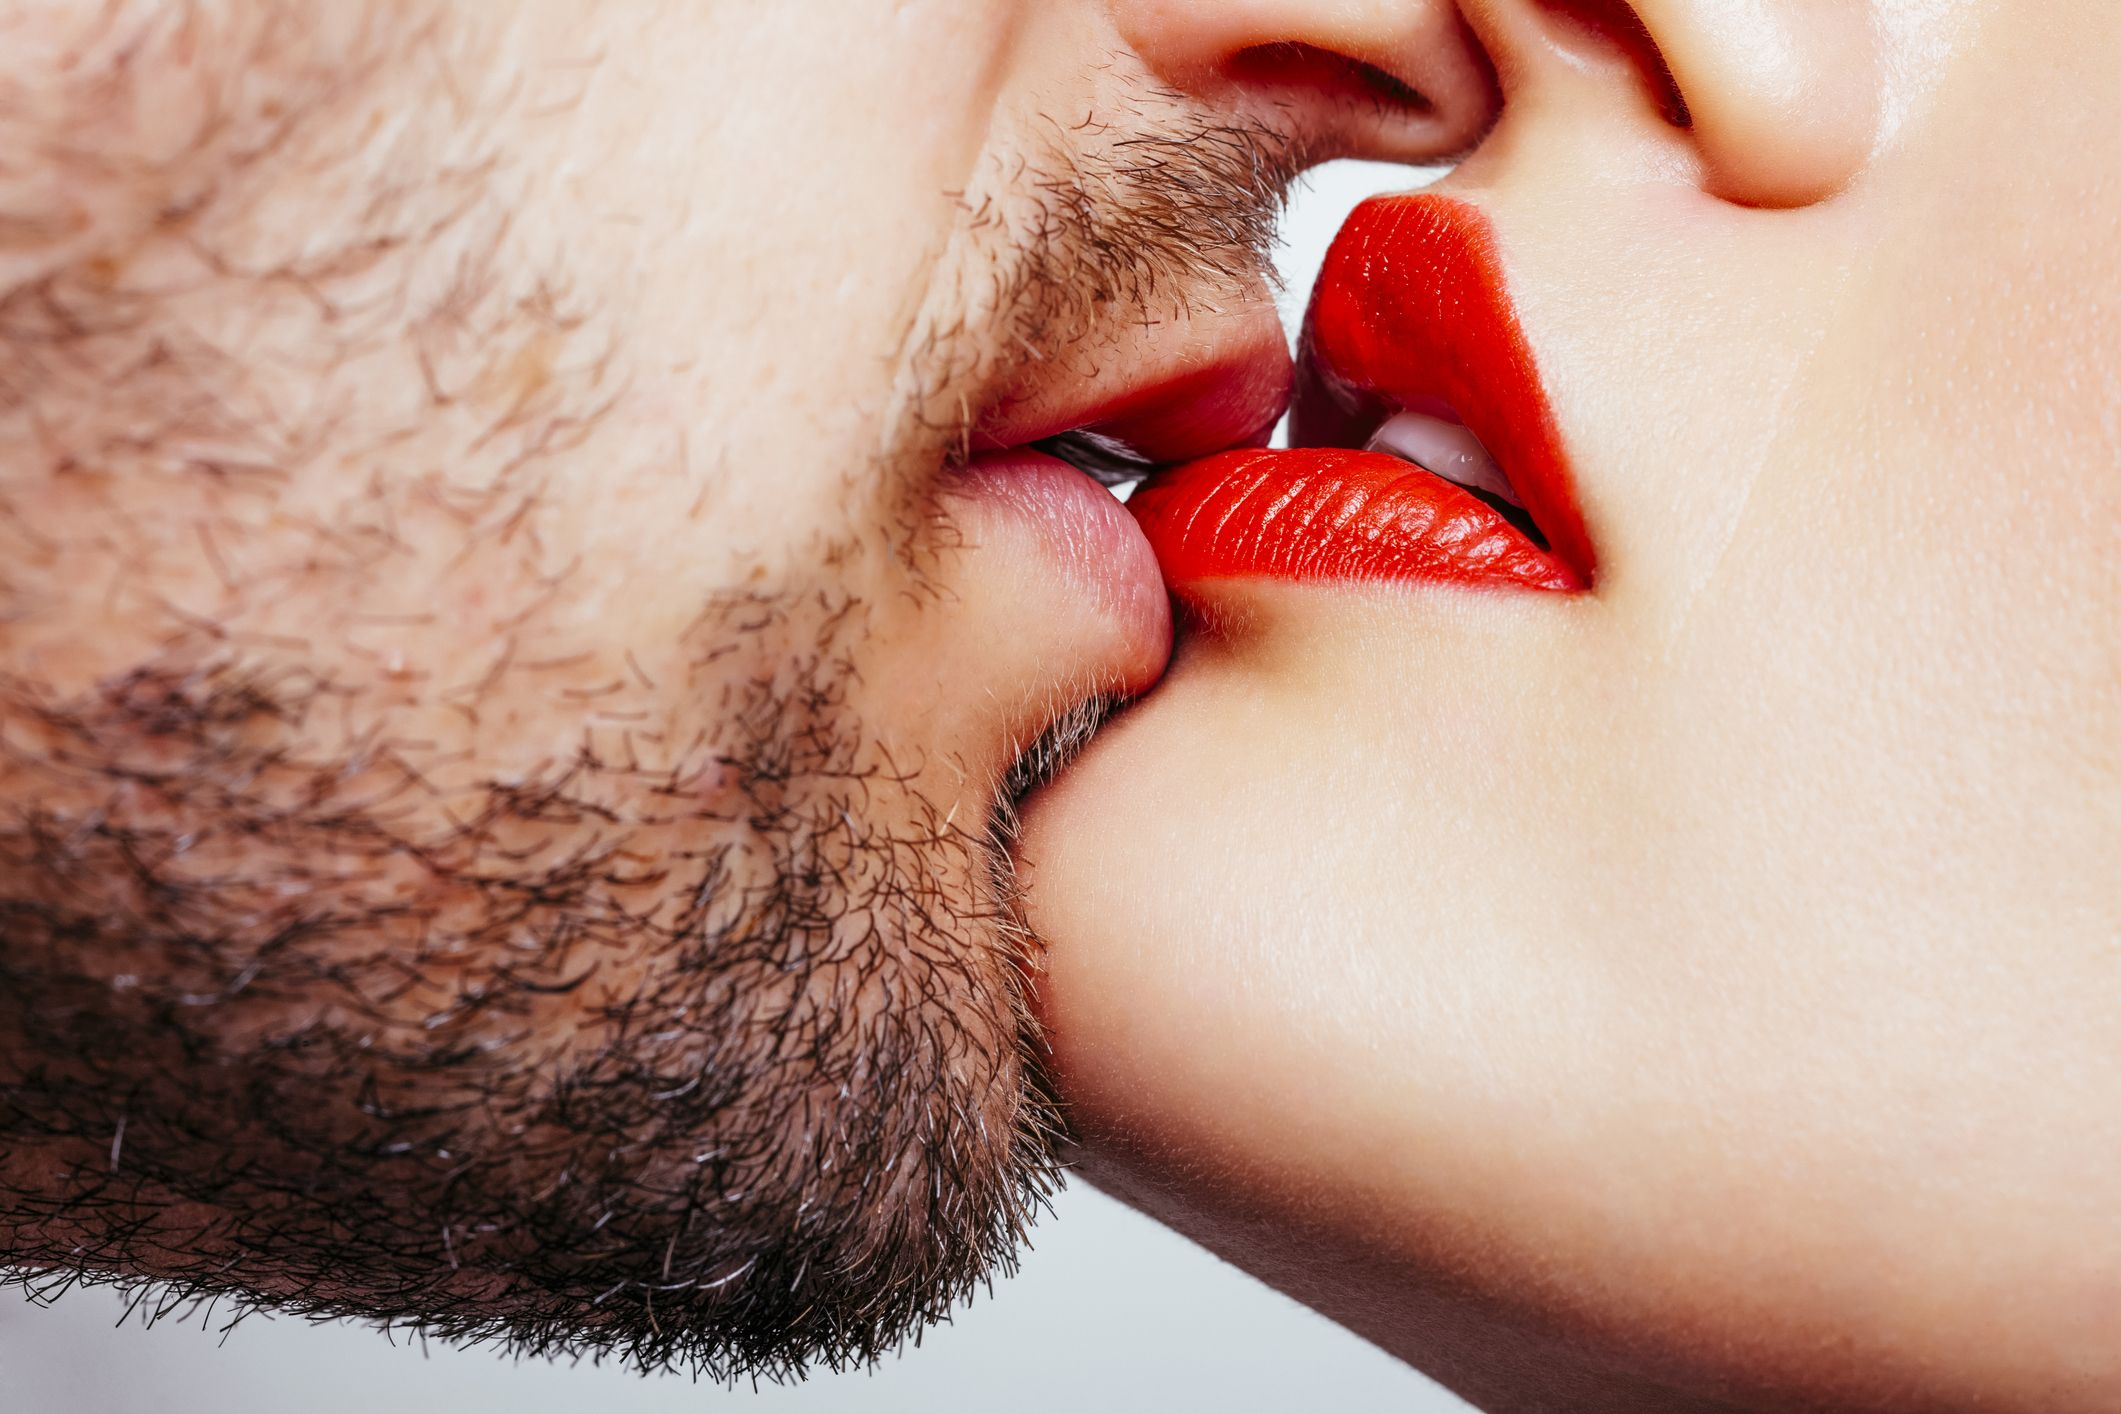 Psichiatrija mirties industrija online dating